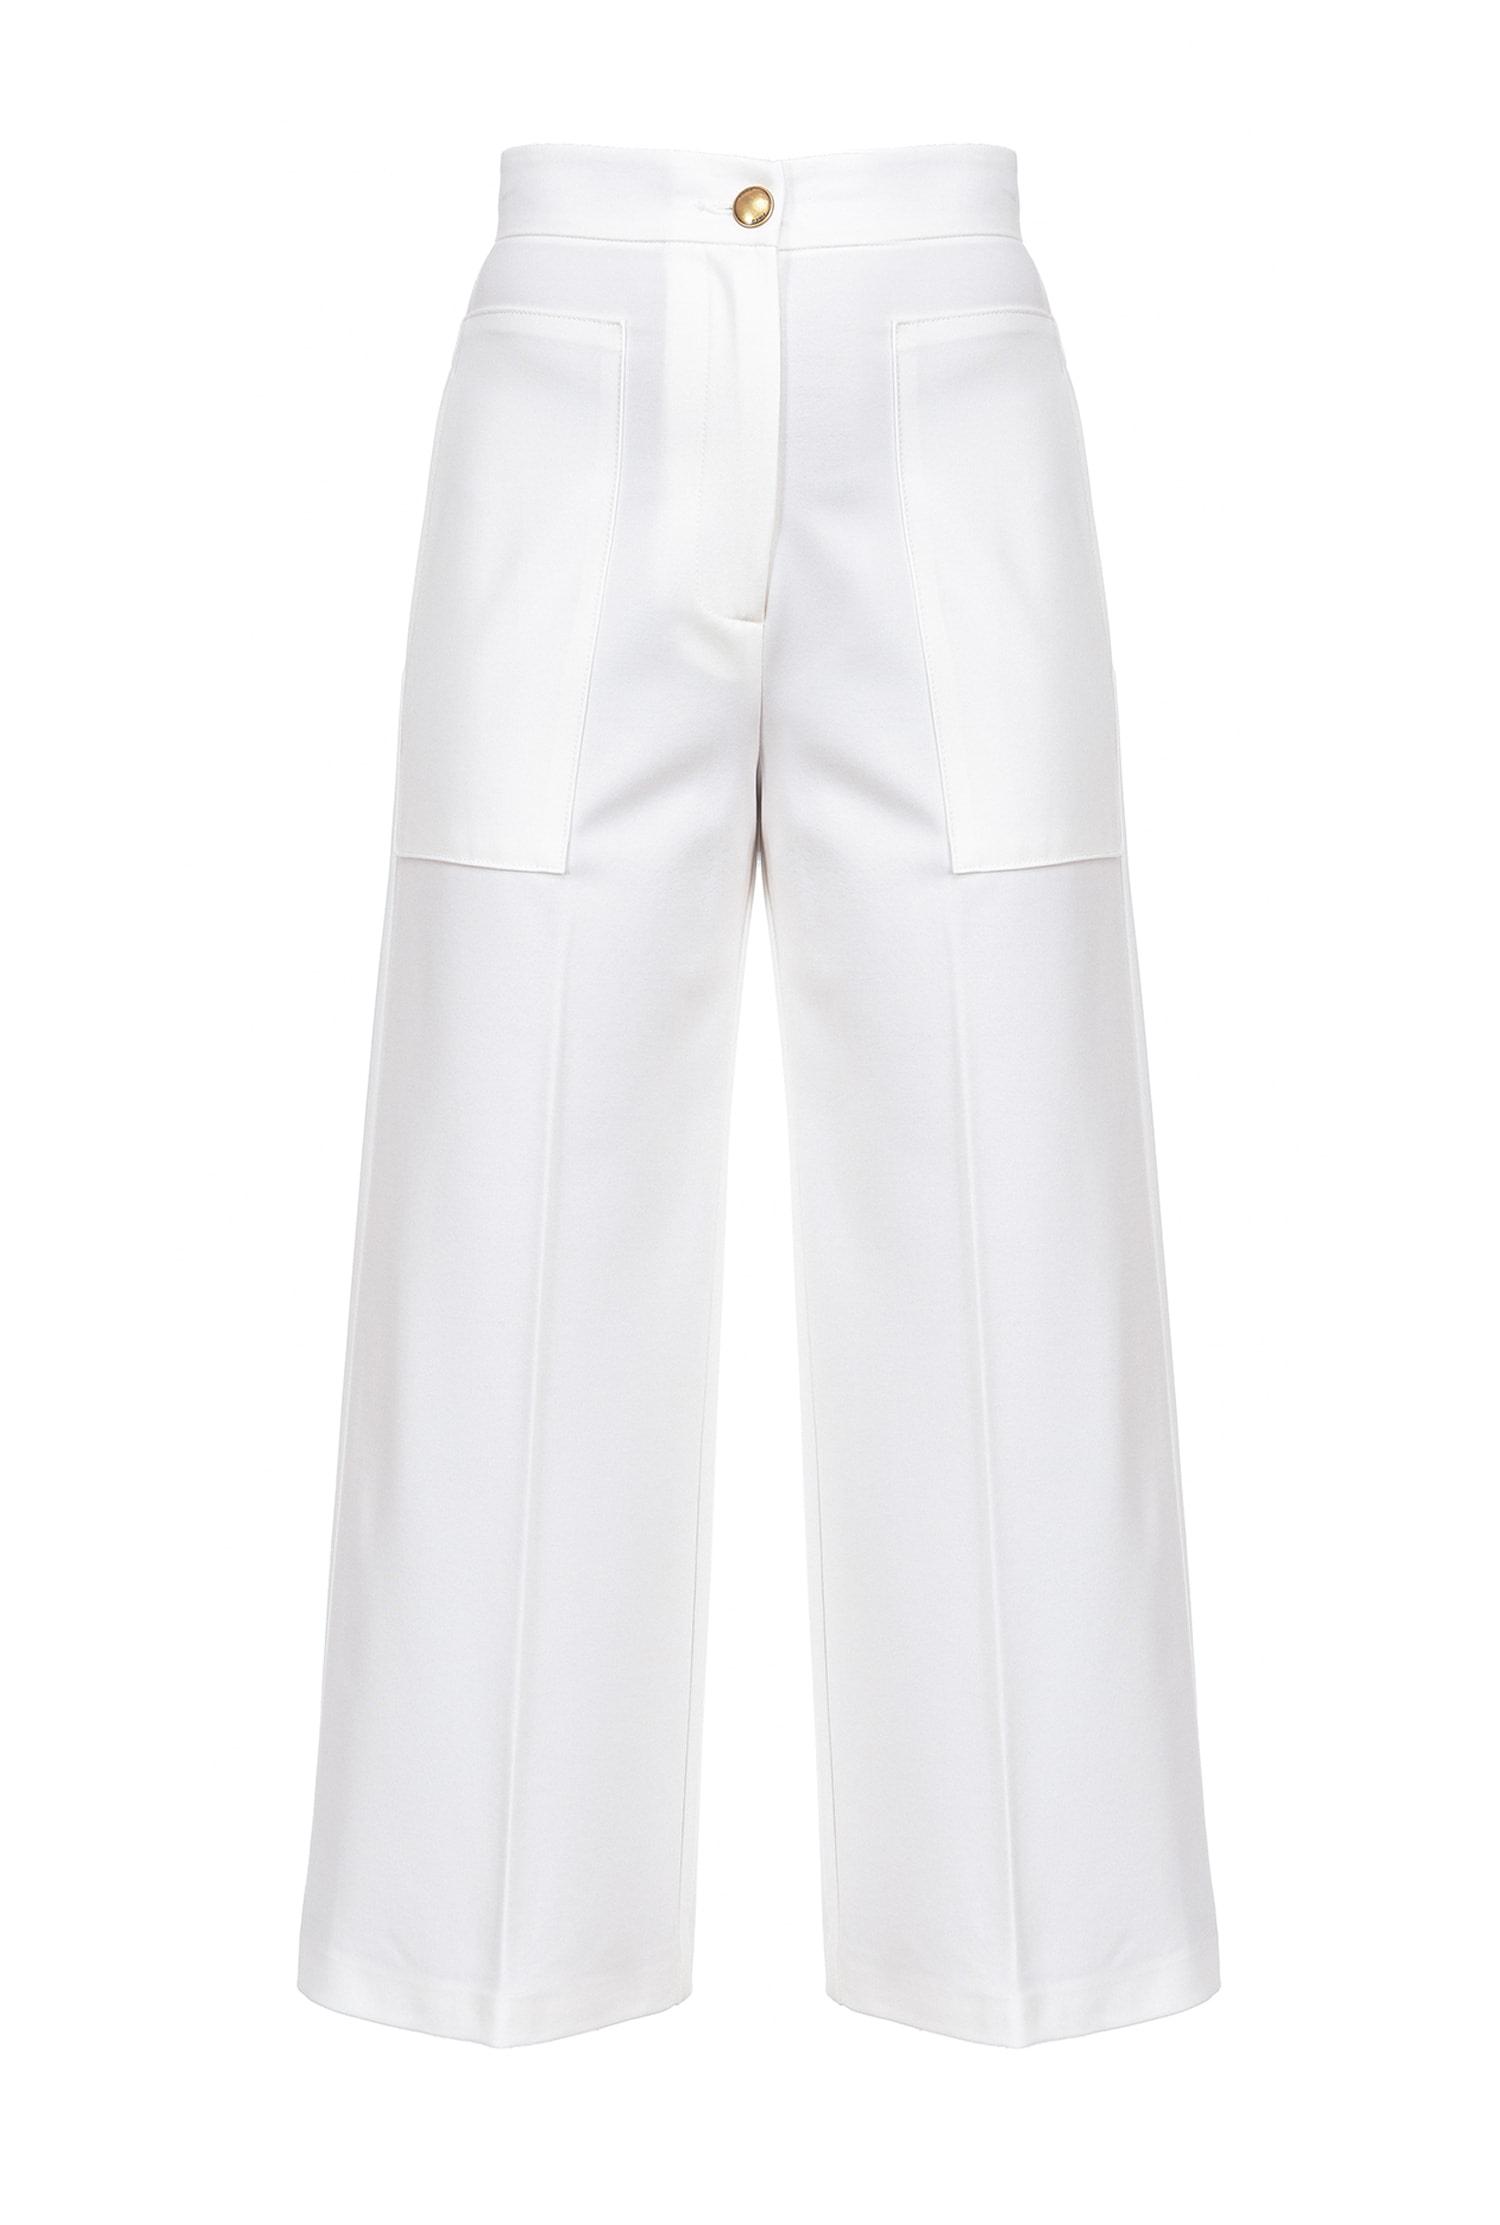 Pantaloni Svelto ampi effetto scuba bianco Pinko